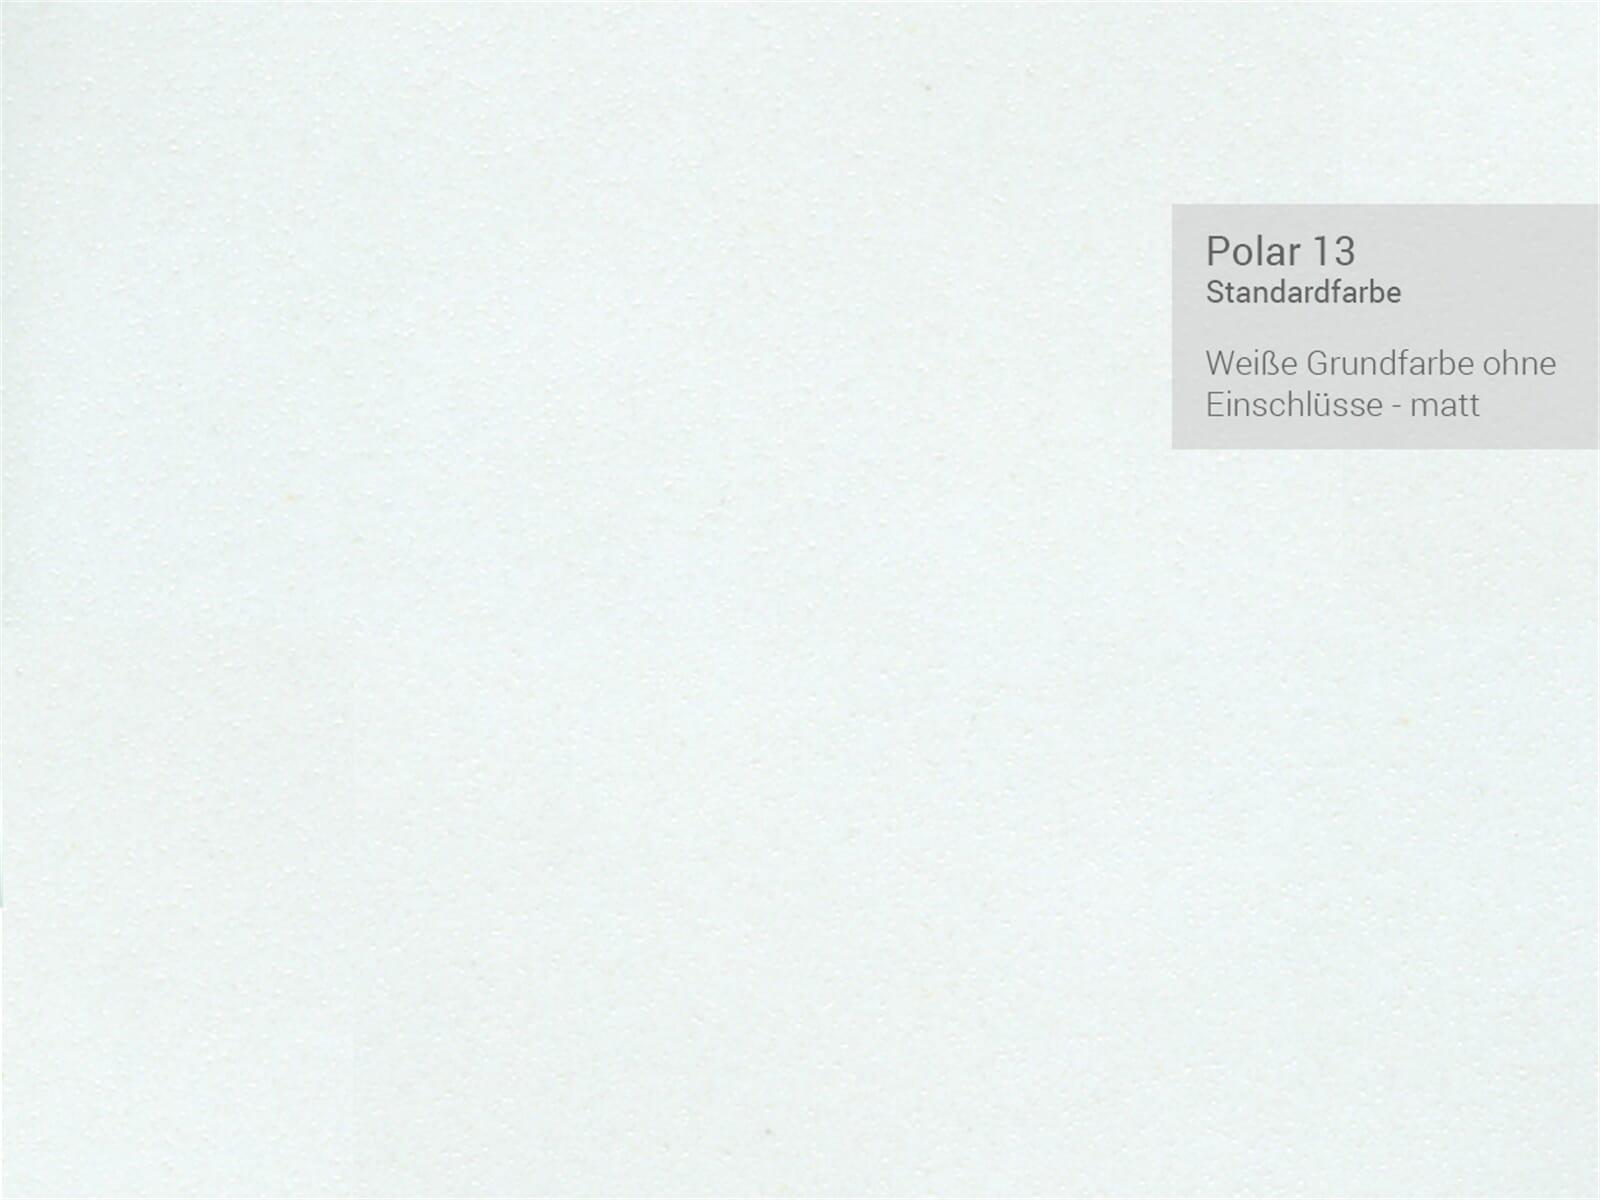 Moebelplus Gmbh systemceram delta 86 polar keramikspüle excenterbetätigung